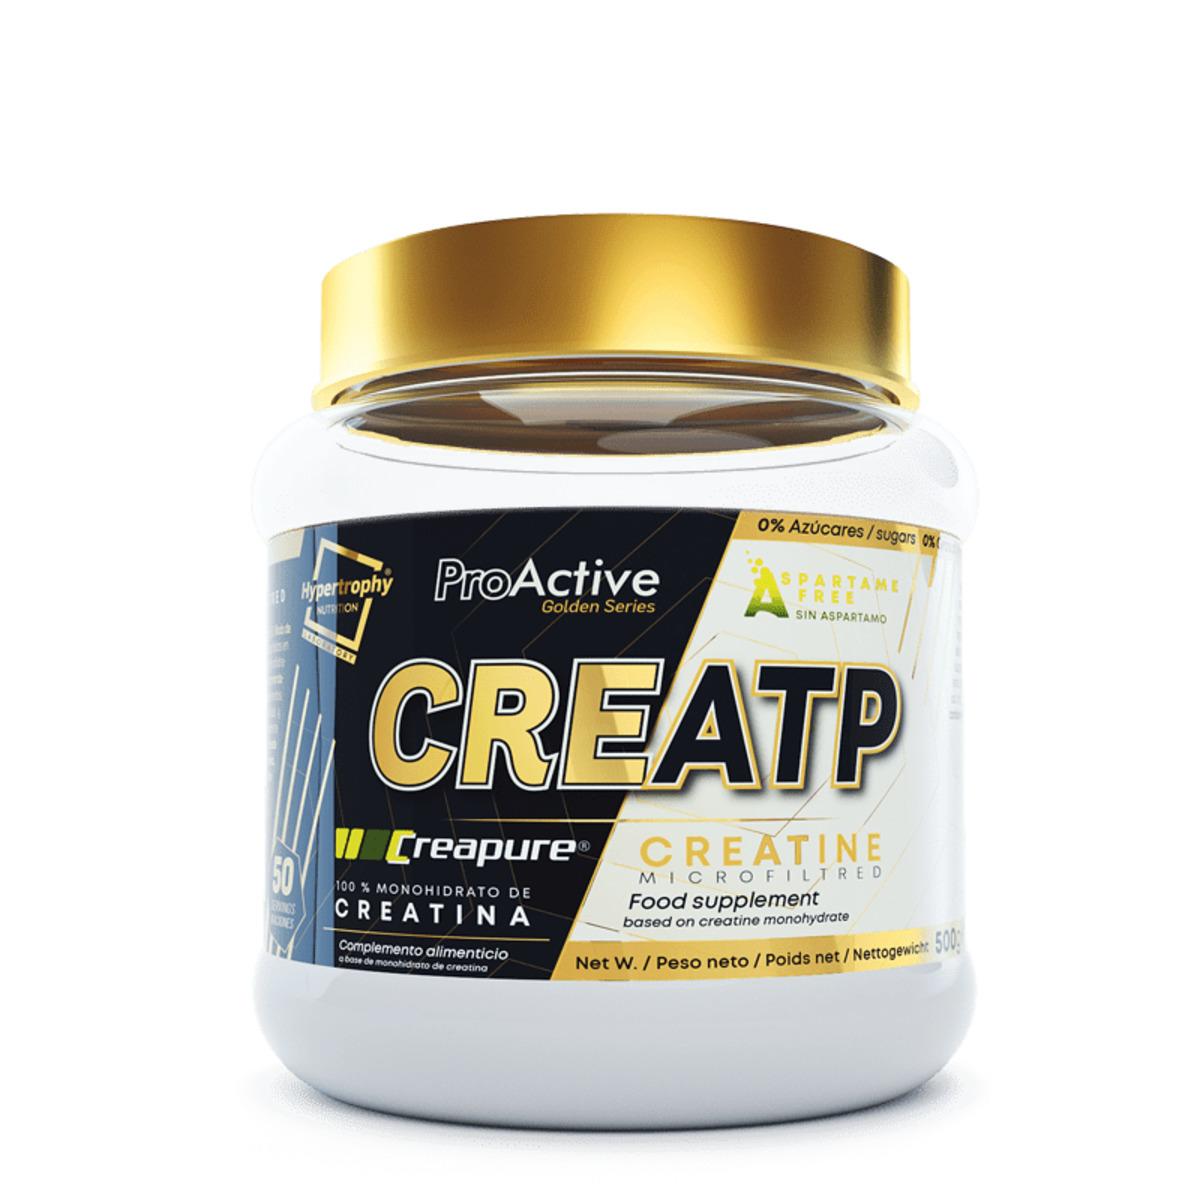 CREATP CREATINA CREAPURE 500G - Hyperotrophy Nutrition